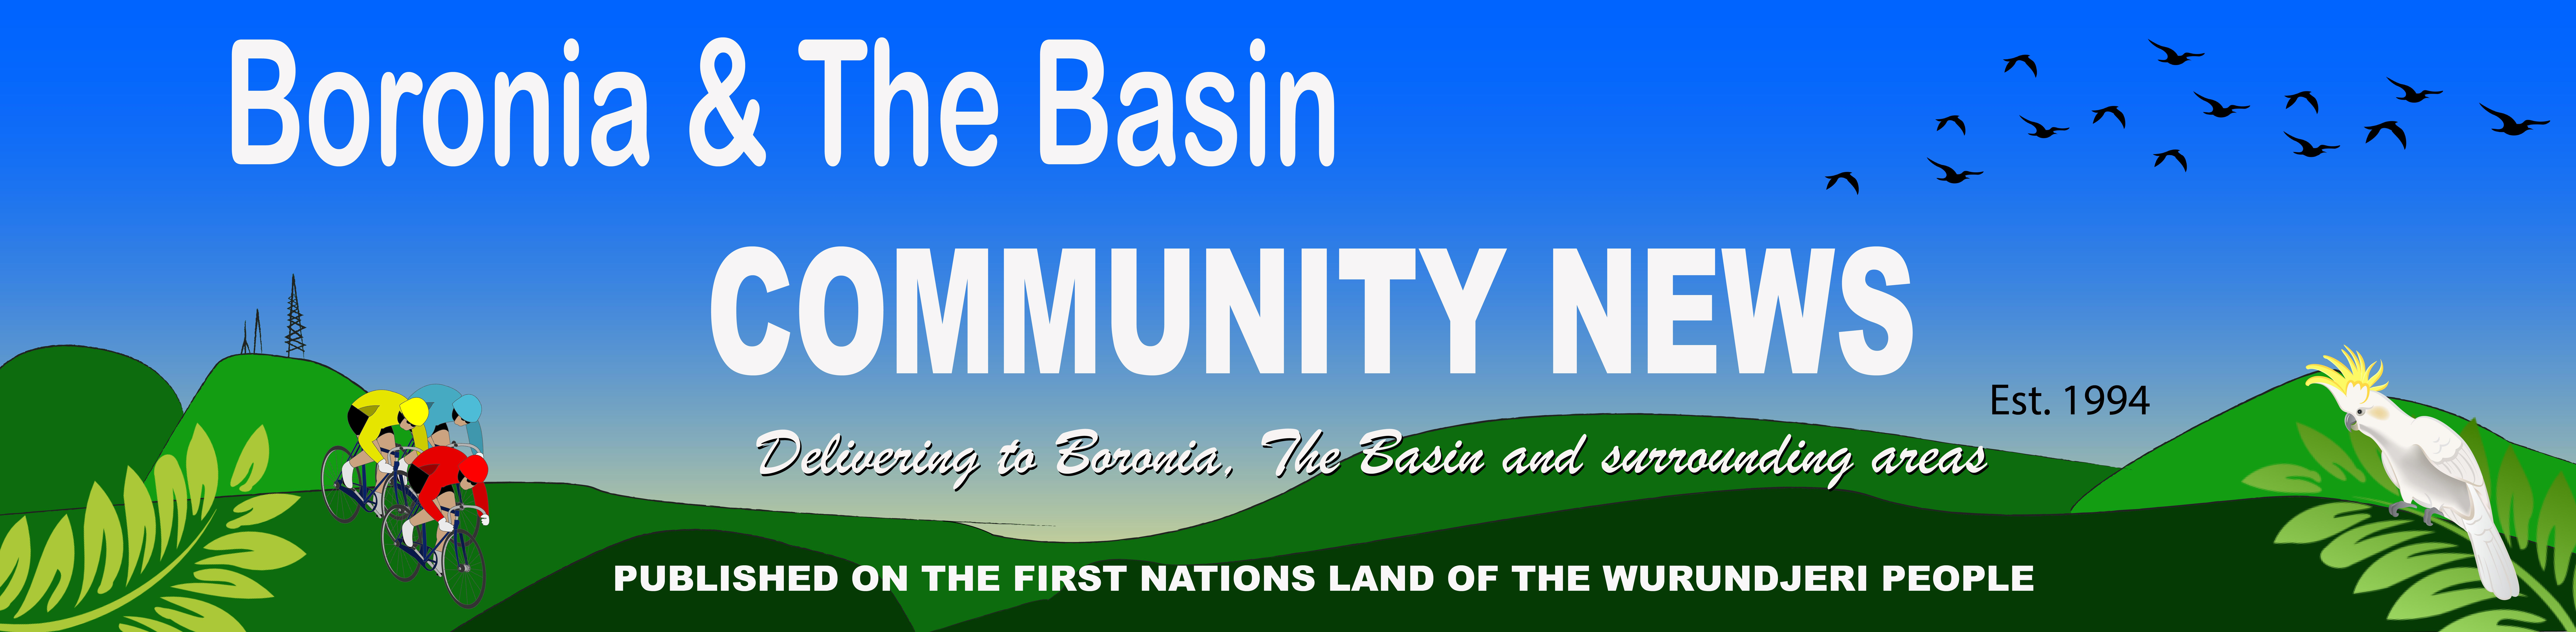 Boronia and The Basin Community News